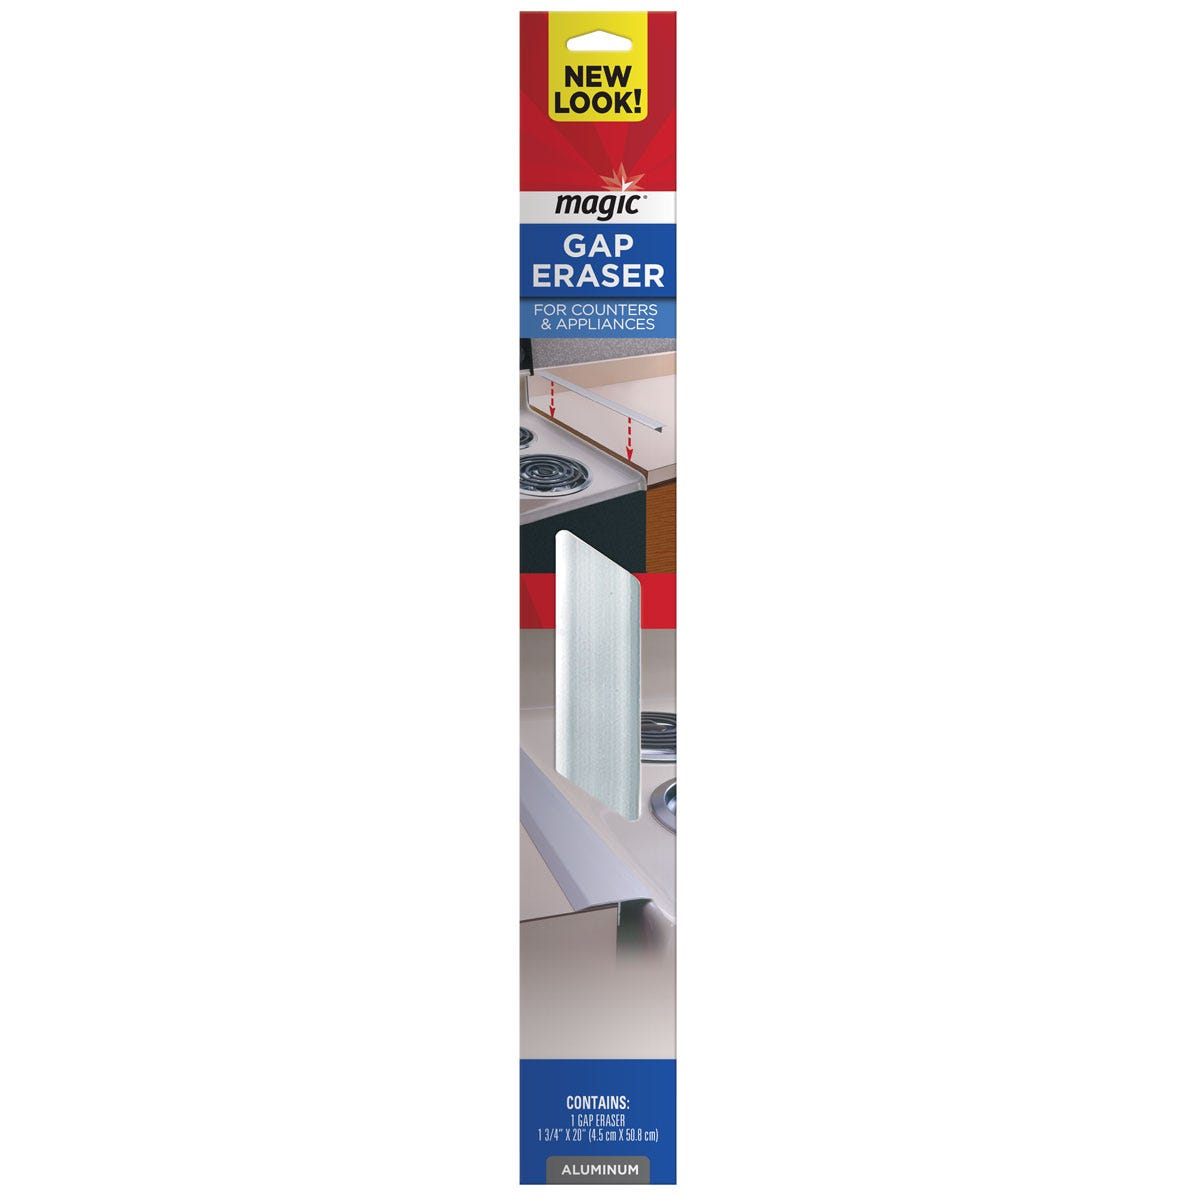 https://googone.com/media/catalog/product/c/o/countertop-appliance-gap-eraser_front.jpg